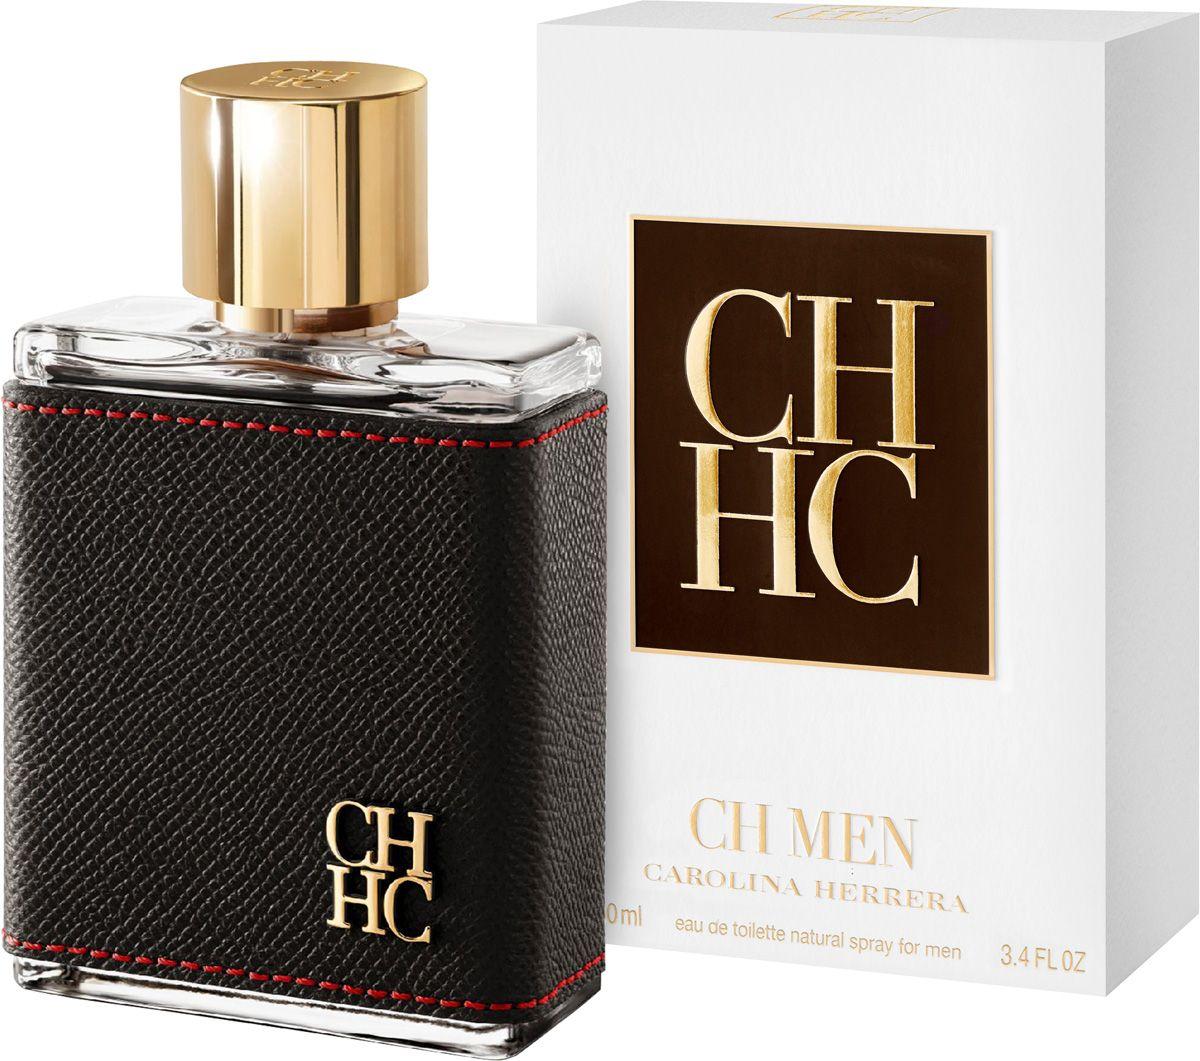 Carolina Herrera Ch Men